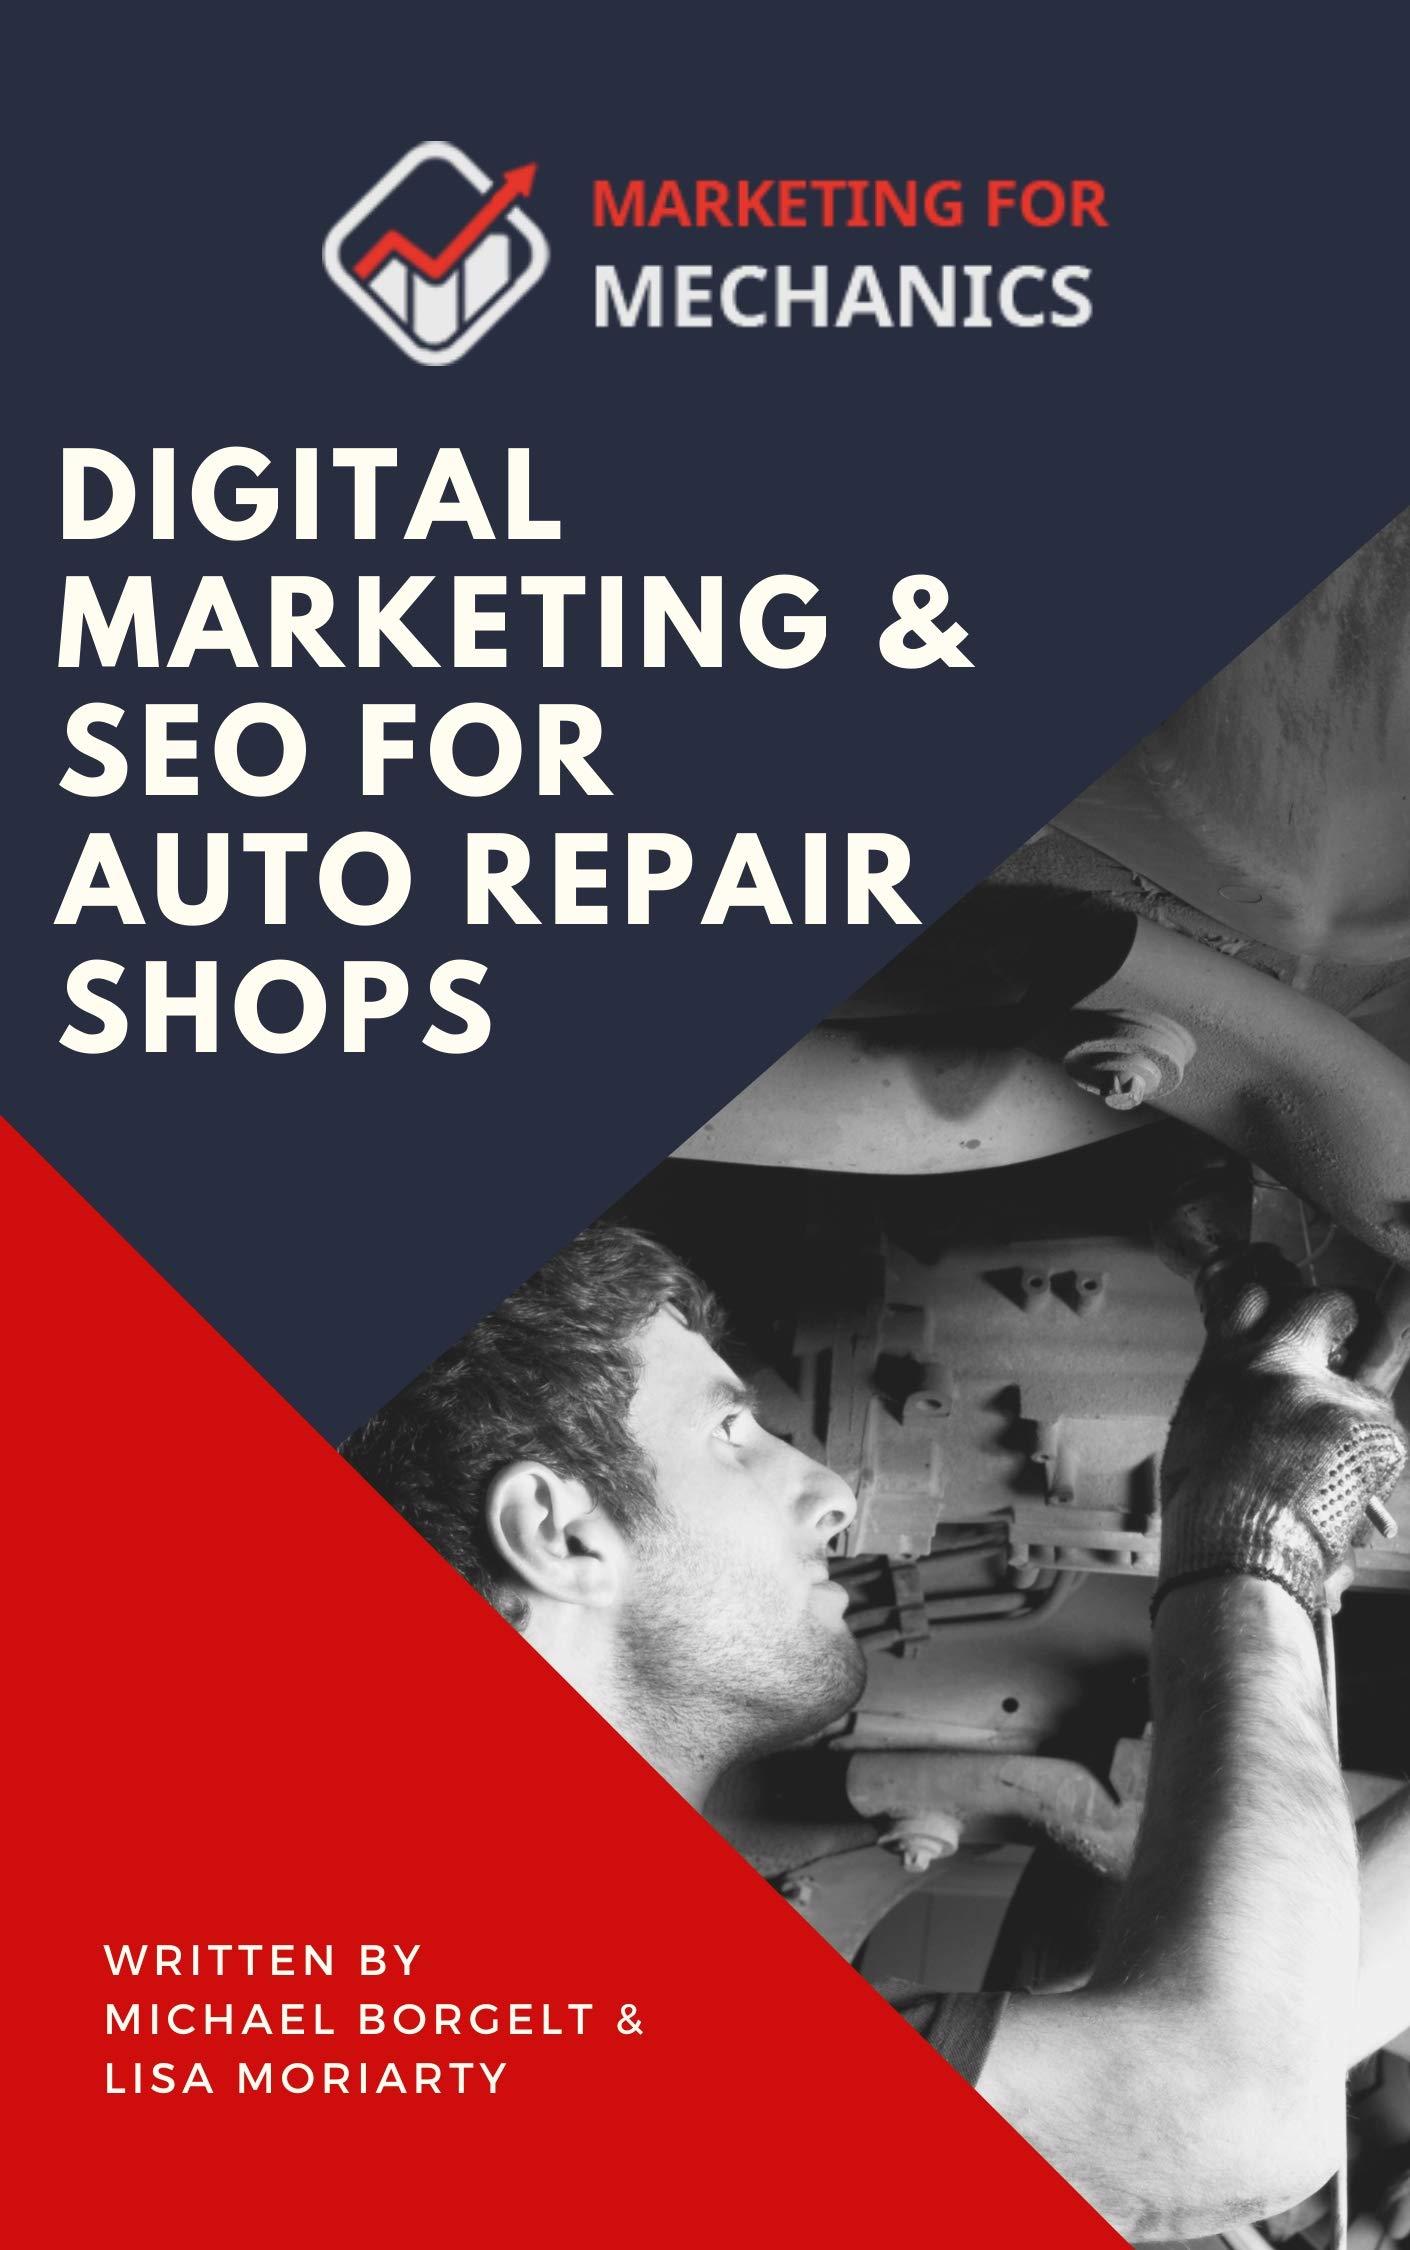 Digital Marketing & SEO for Auto Repair Shops